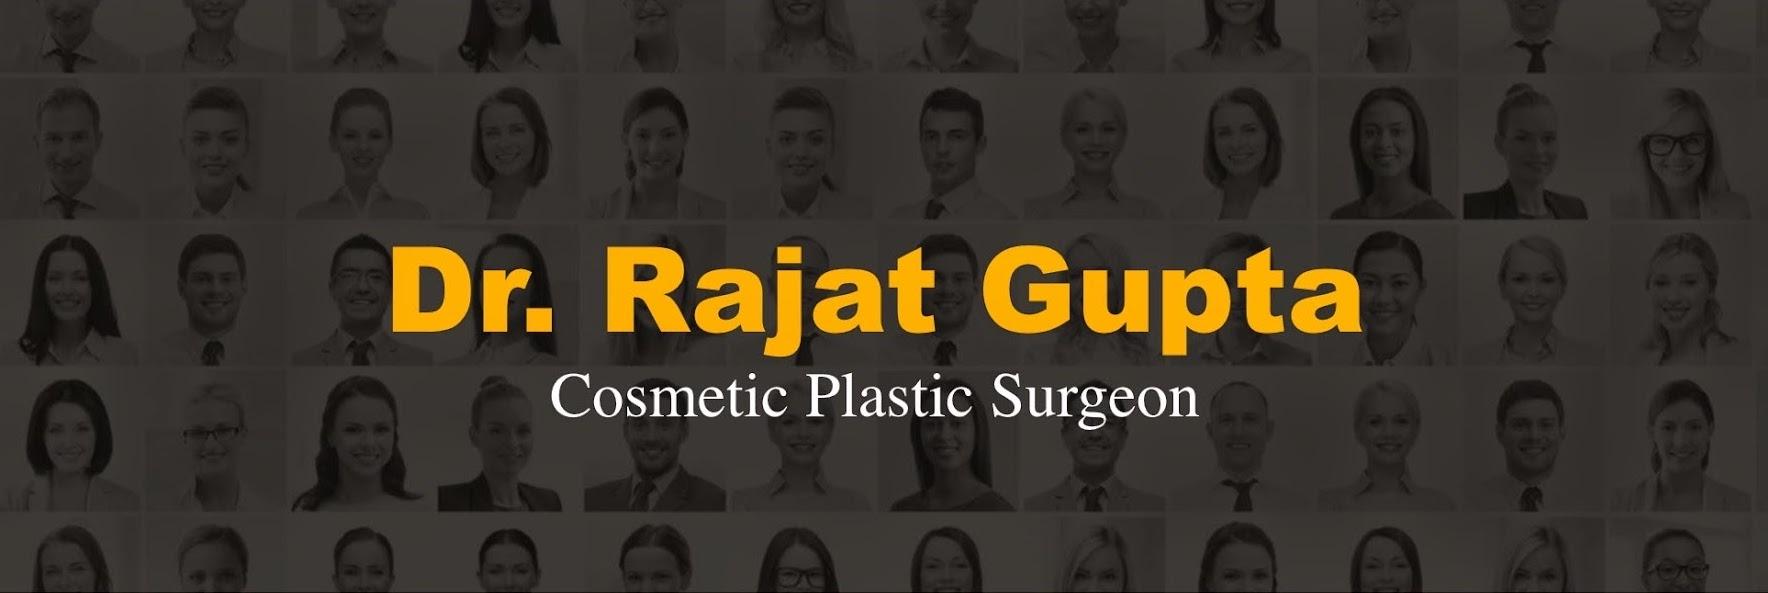 Dr Rajat Gupta - RG Aesthetics (@drrajatgupta) Cover Image